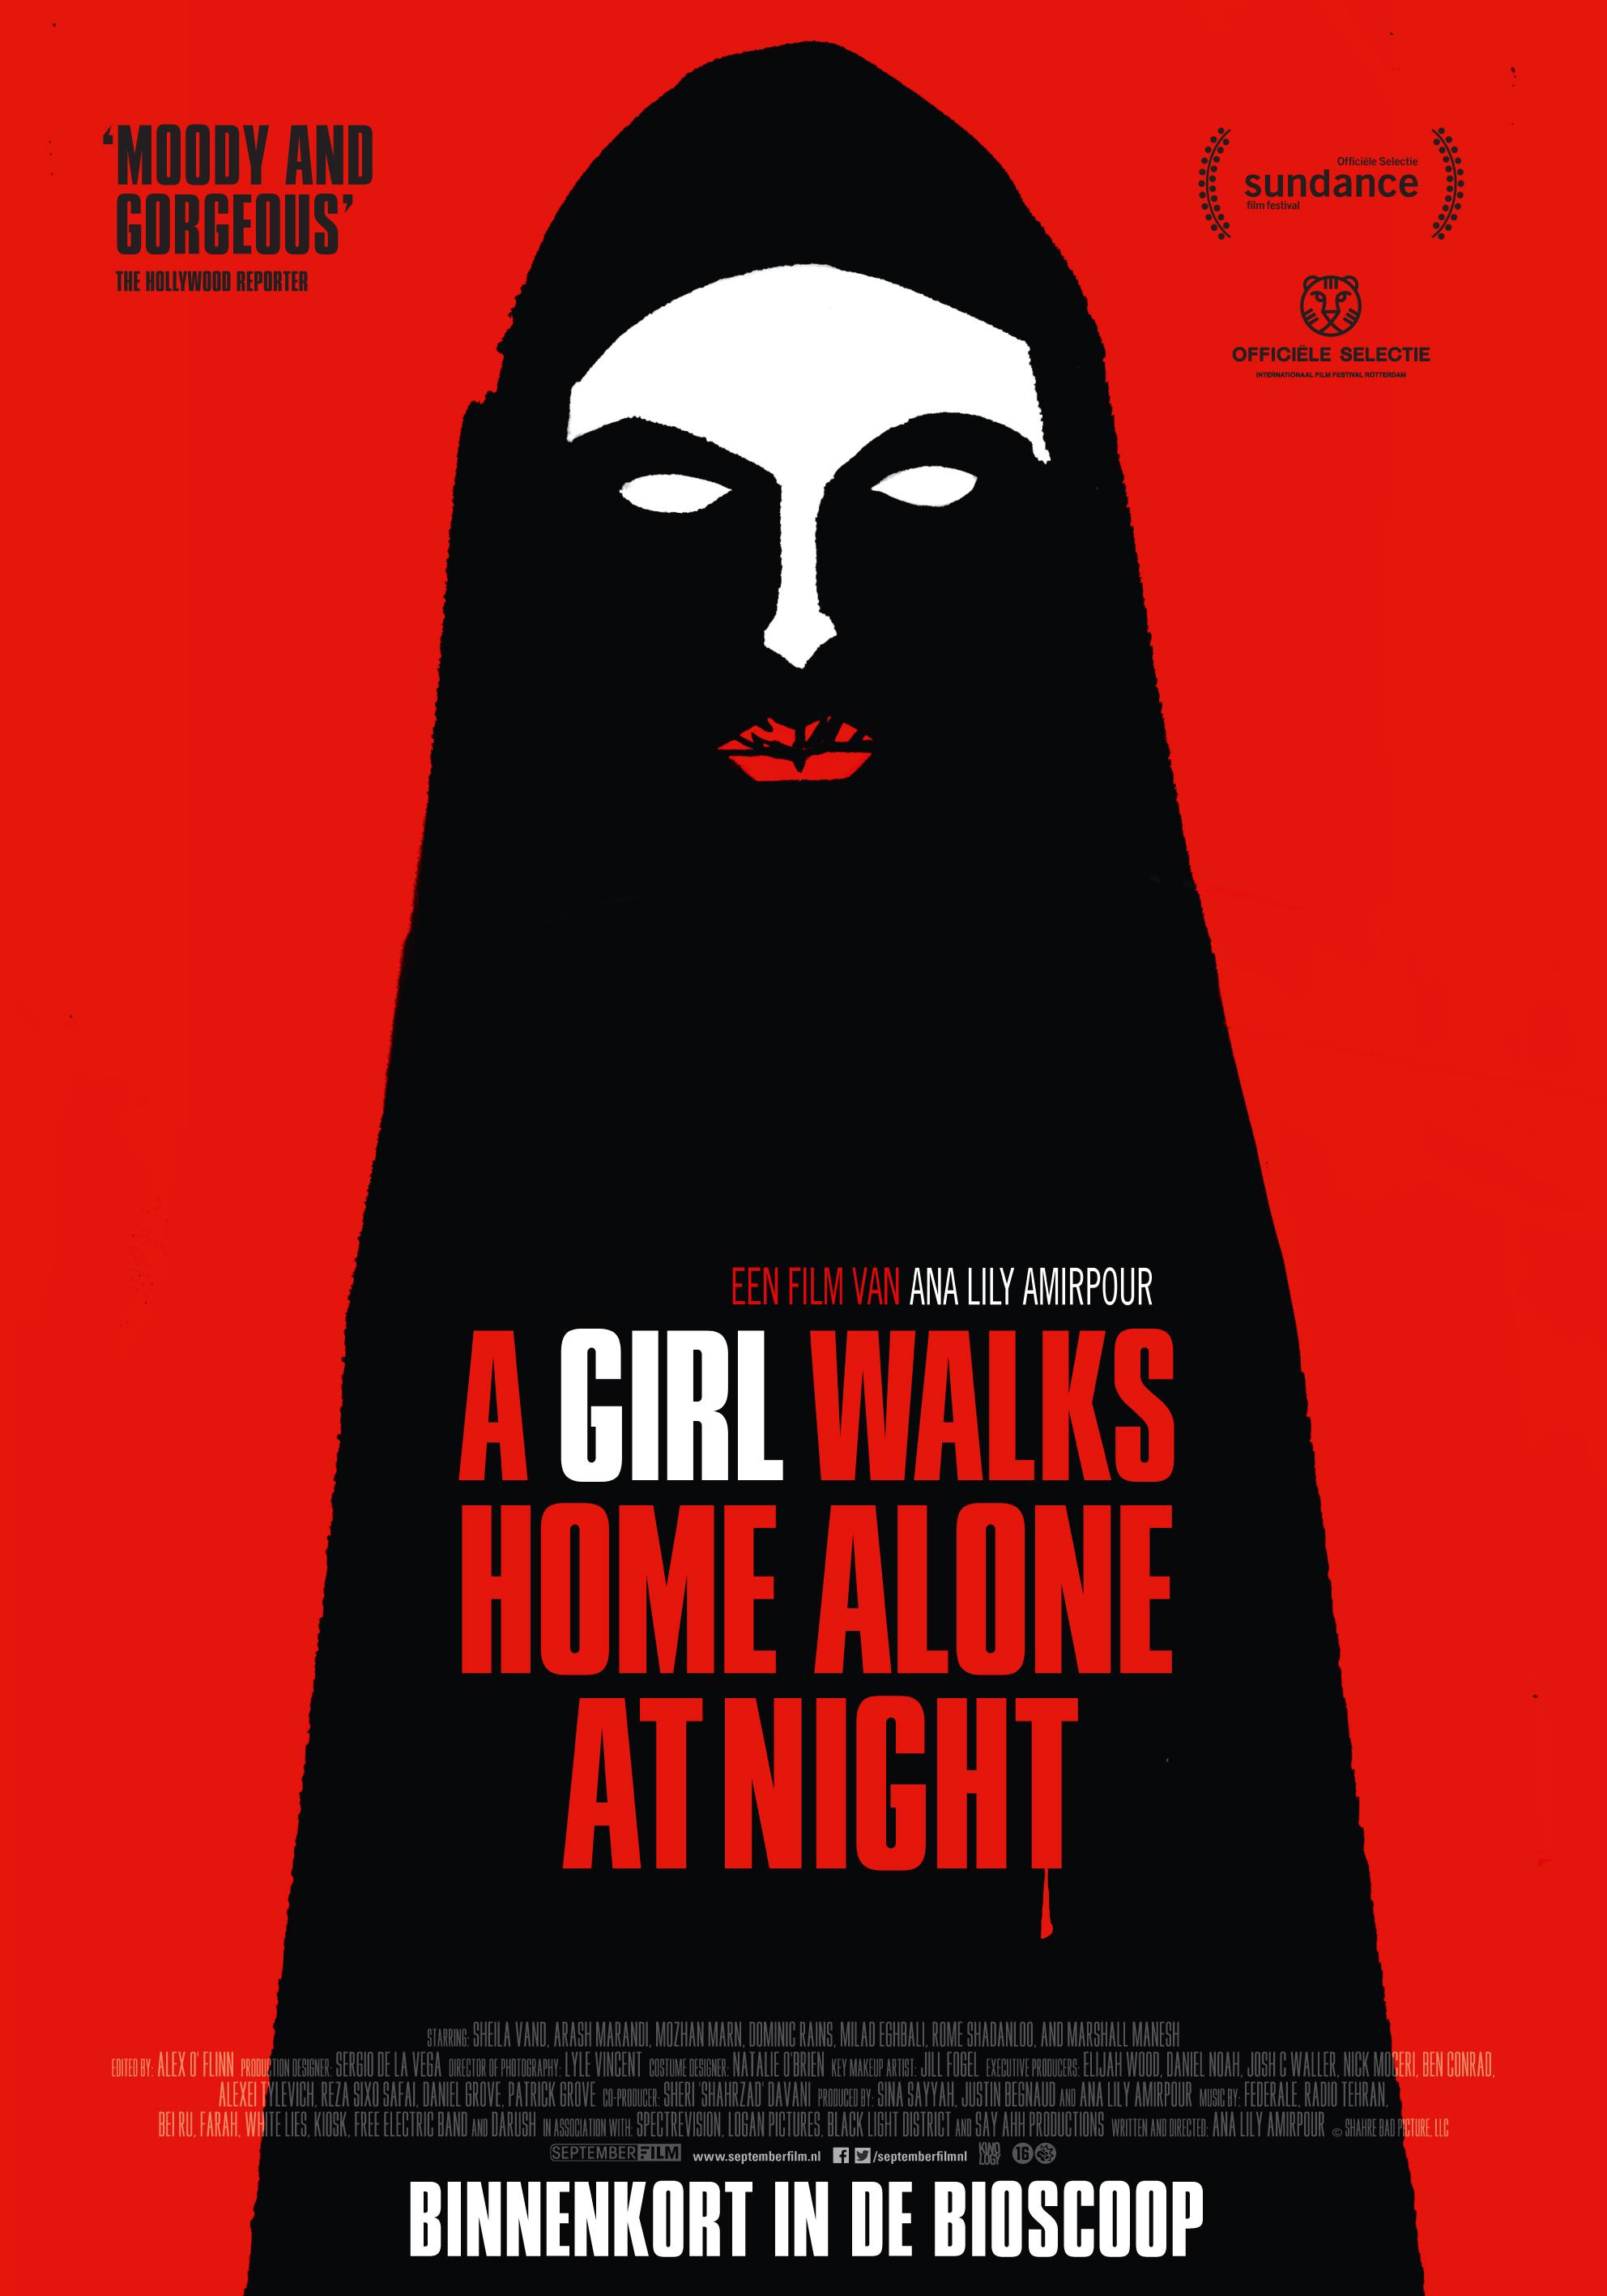 AGirlWalksHomeAloneAtNight_Poster_70x100.indd